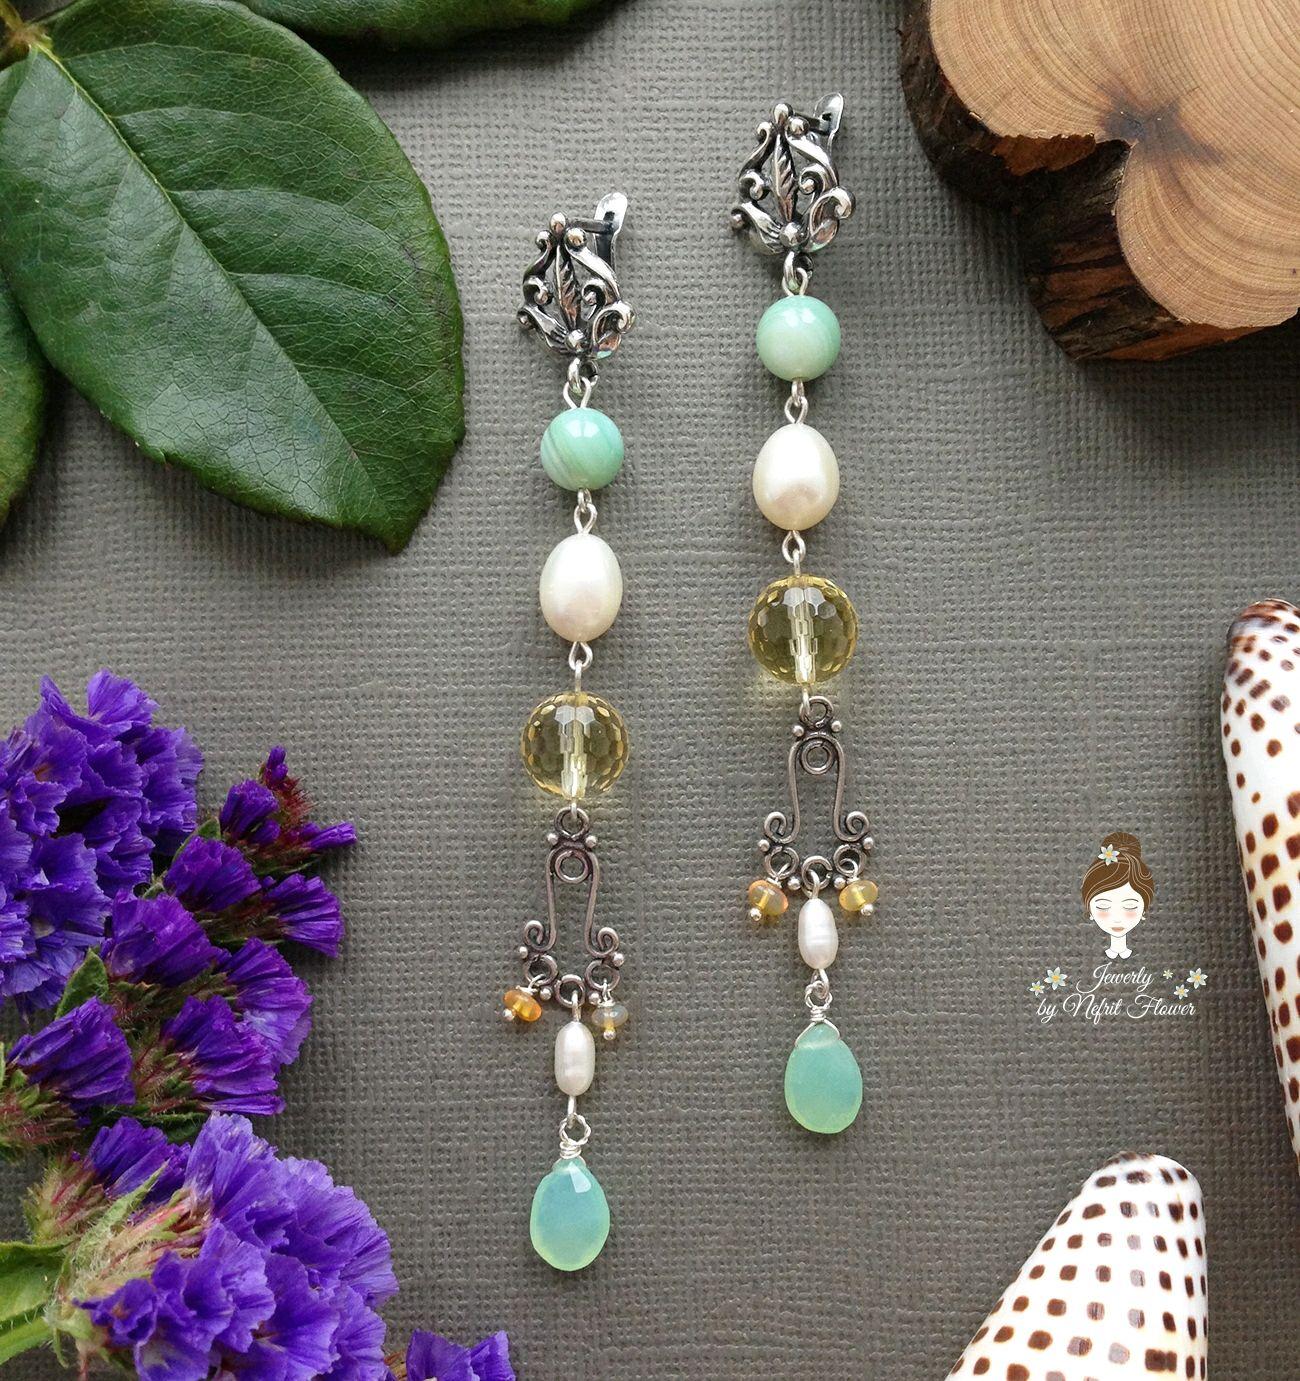 Earrings with opal 'Inspiration' 925 sterling silver green yellow, Earrings, St. Petersburg,  Фото №1